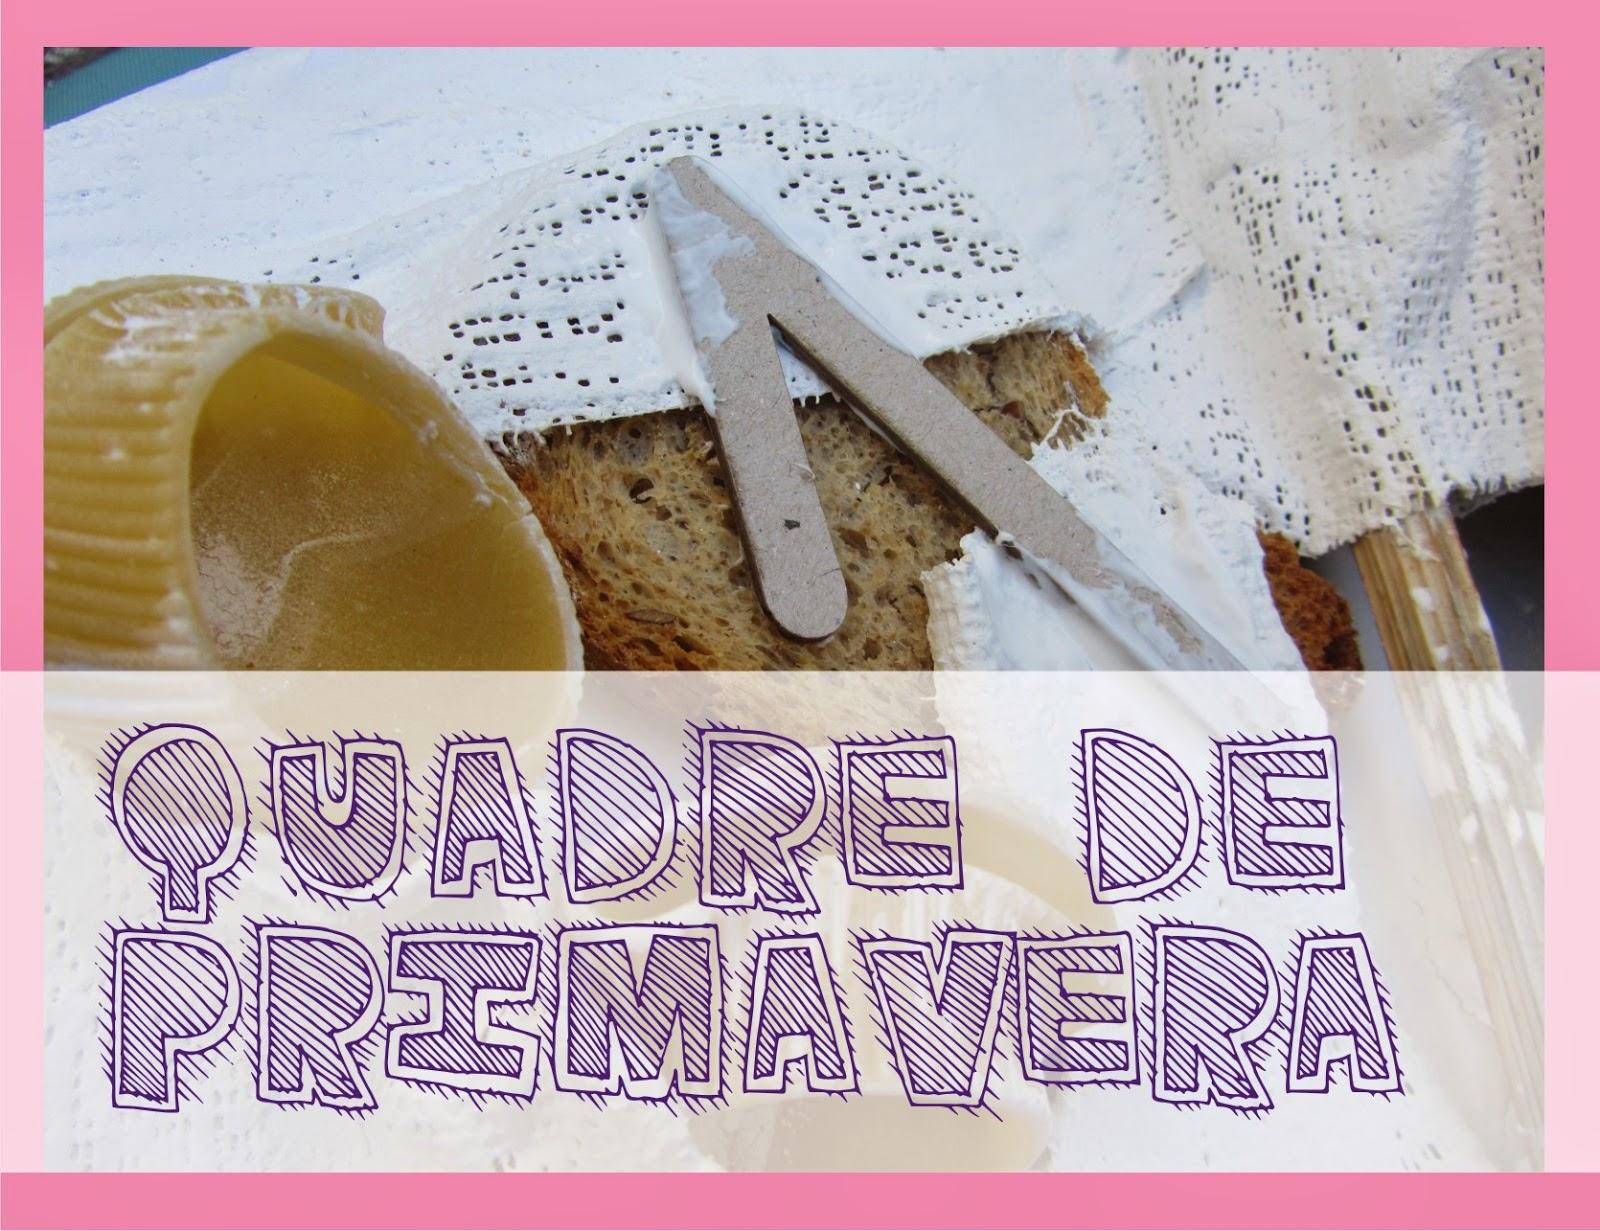 http://dosprincesespintem.blogspot.com.es/2014/05/quadre-n4-de-primavera.html